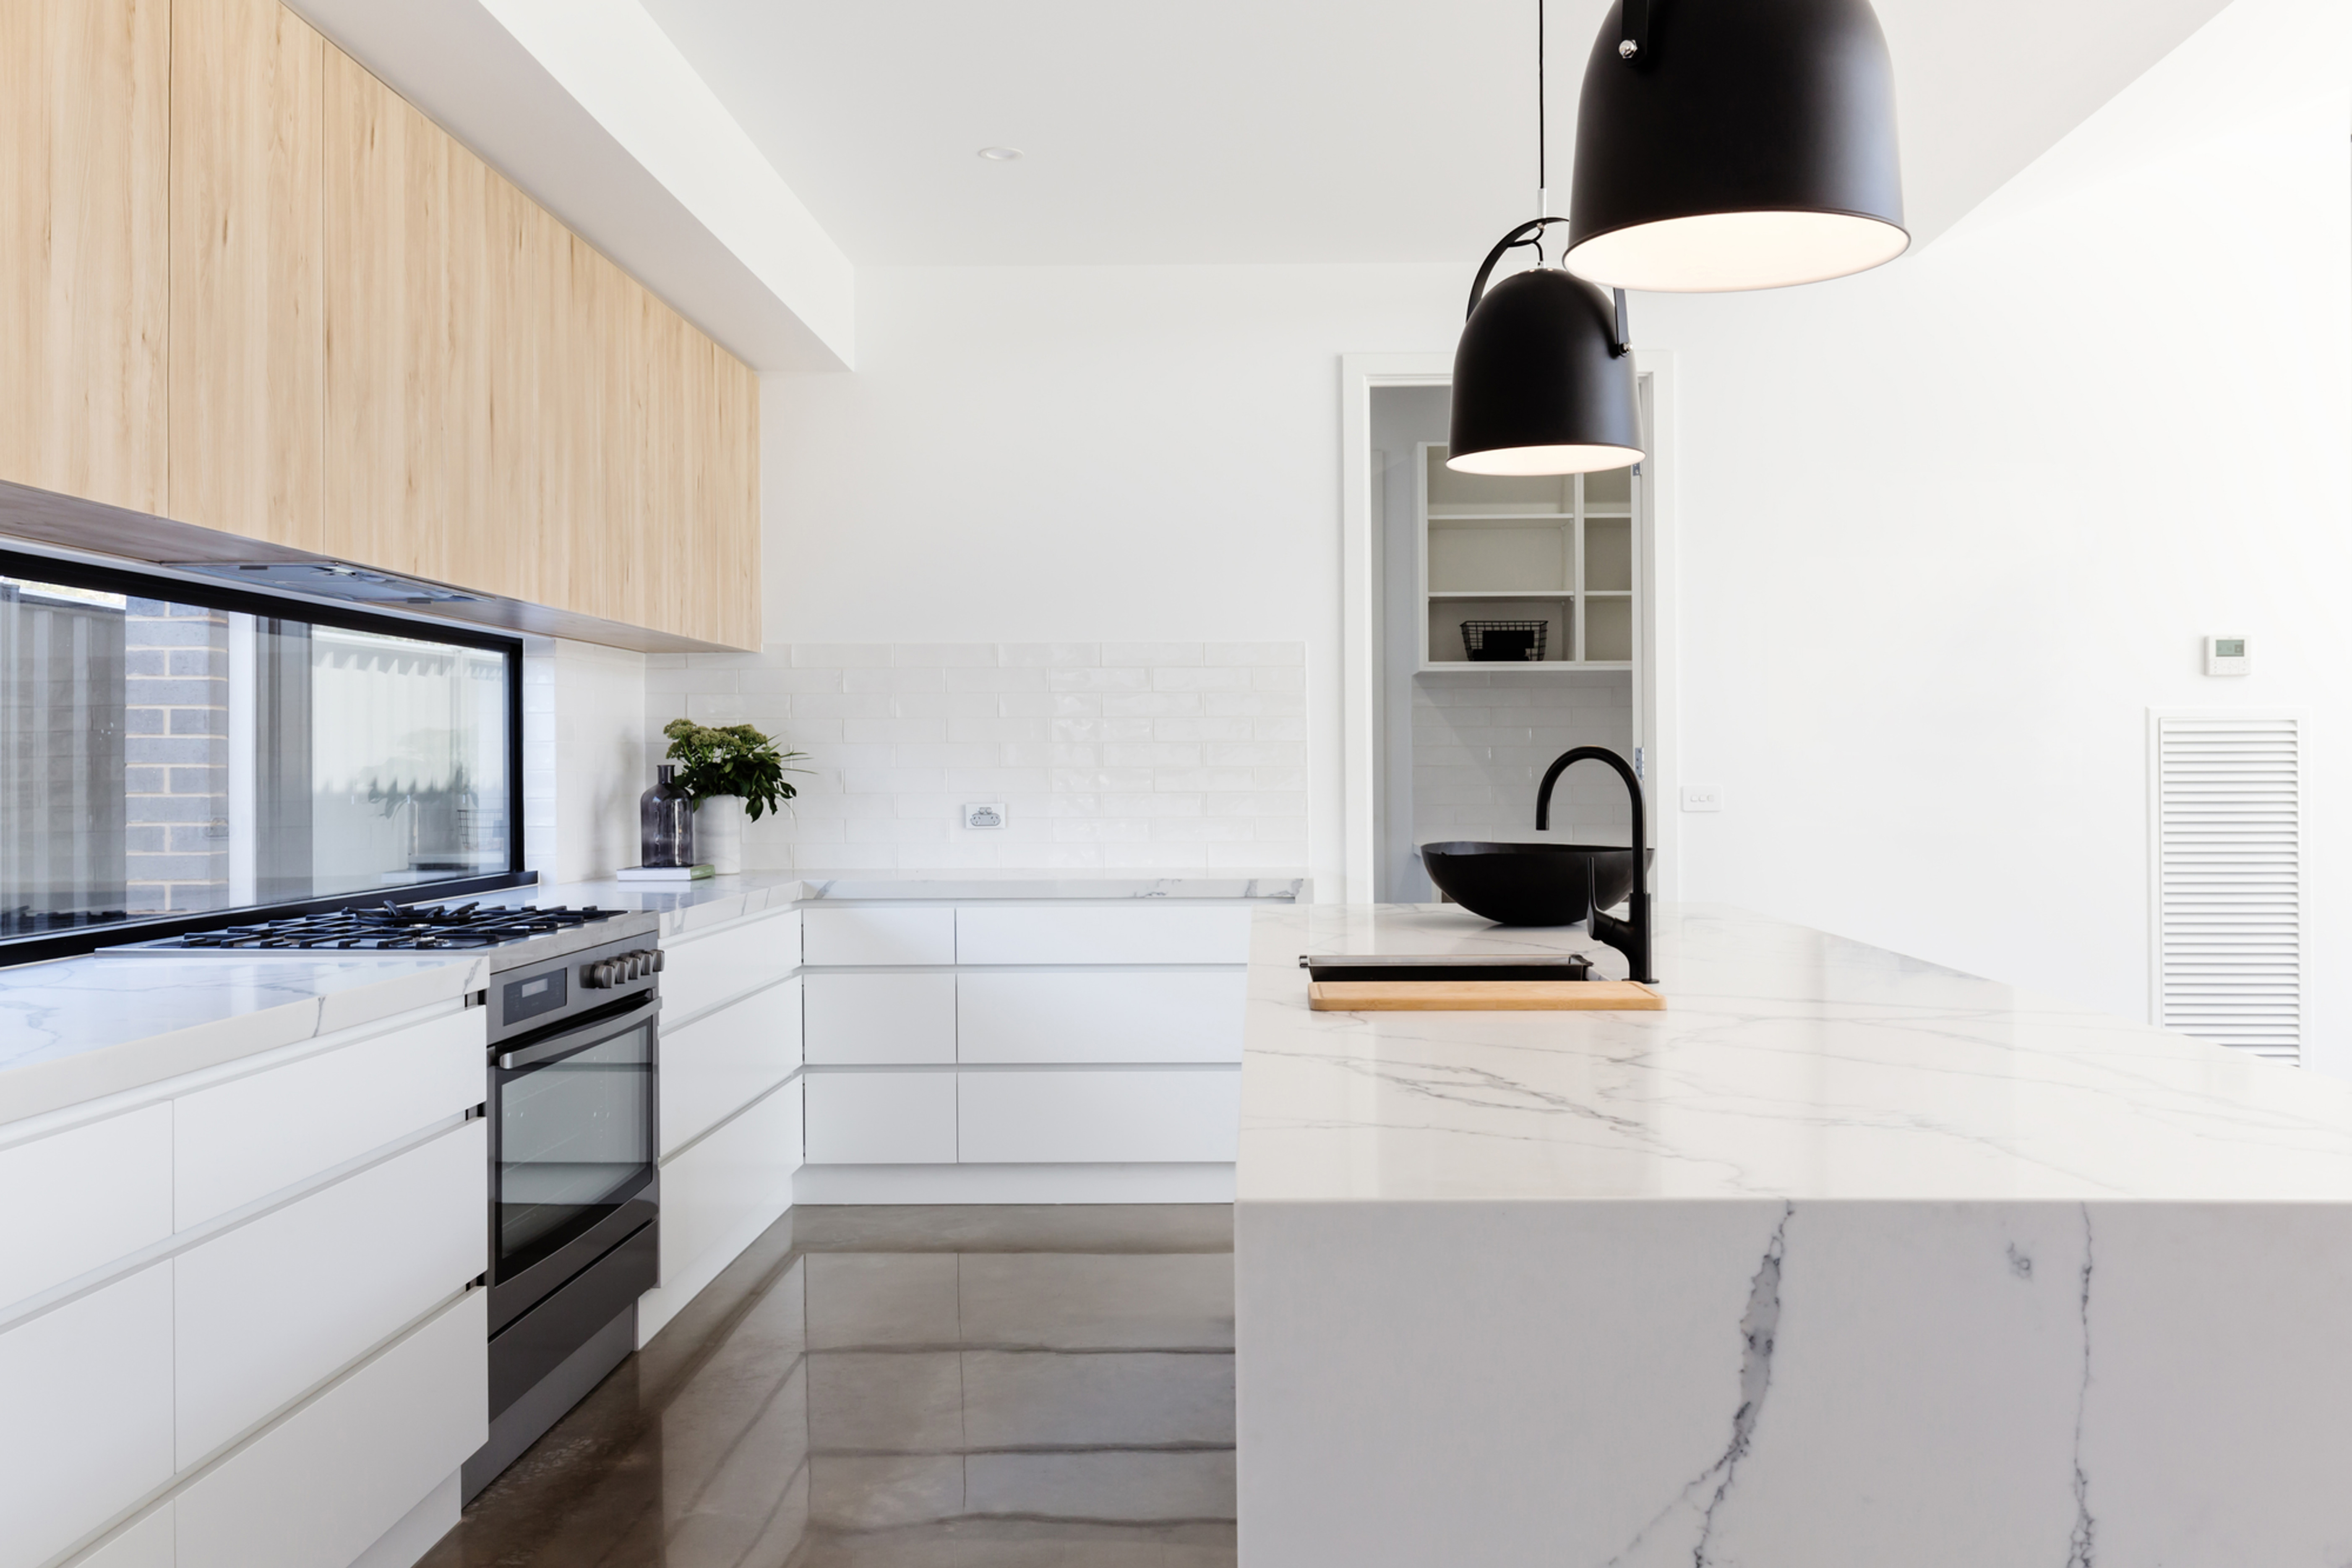 Residential Remodel/Renovation